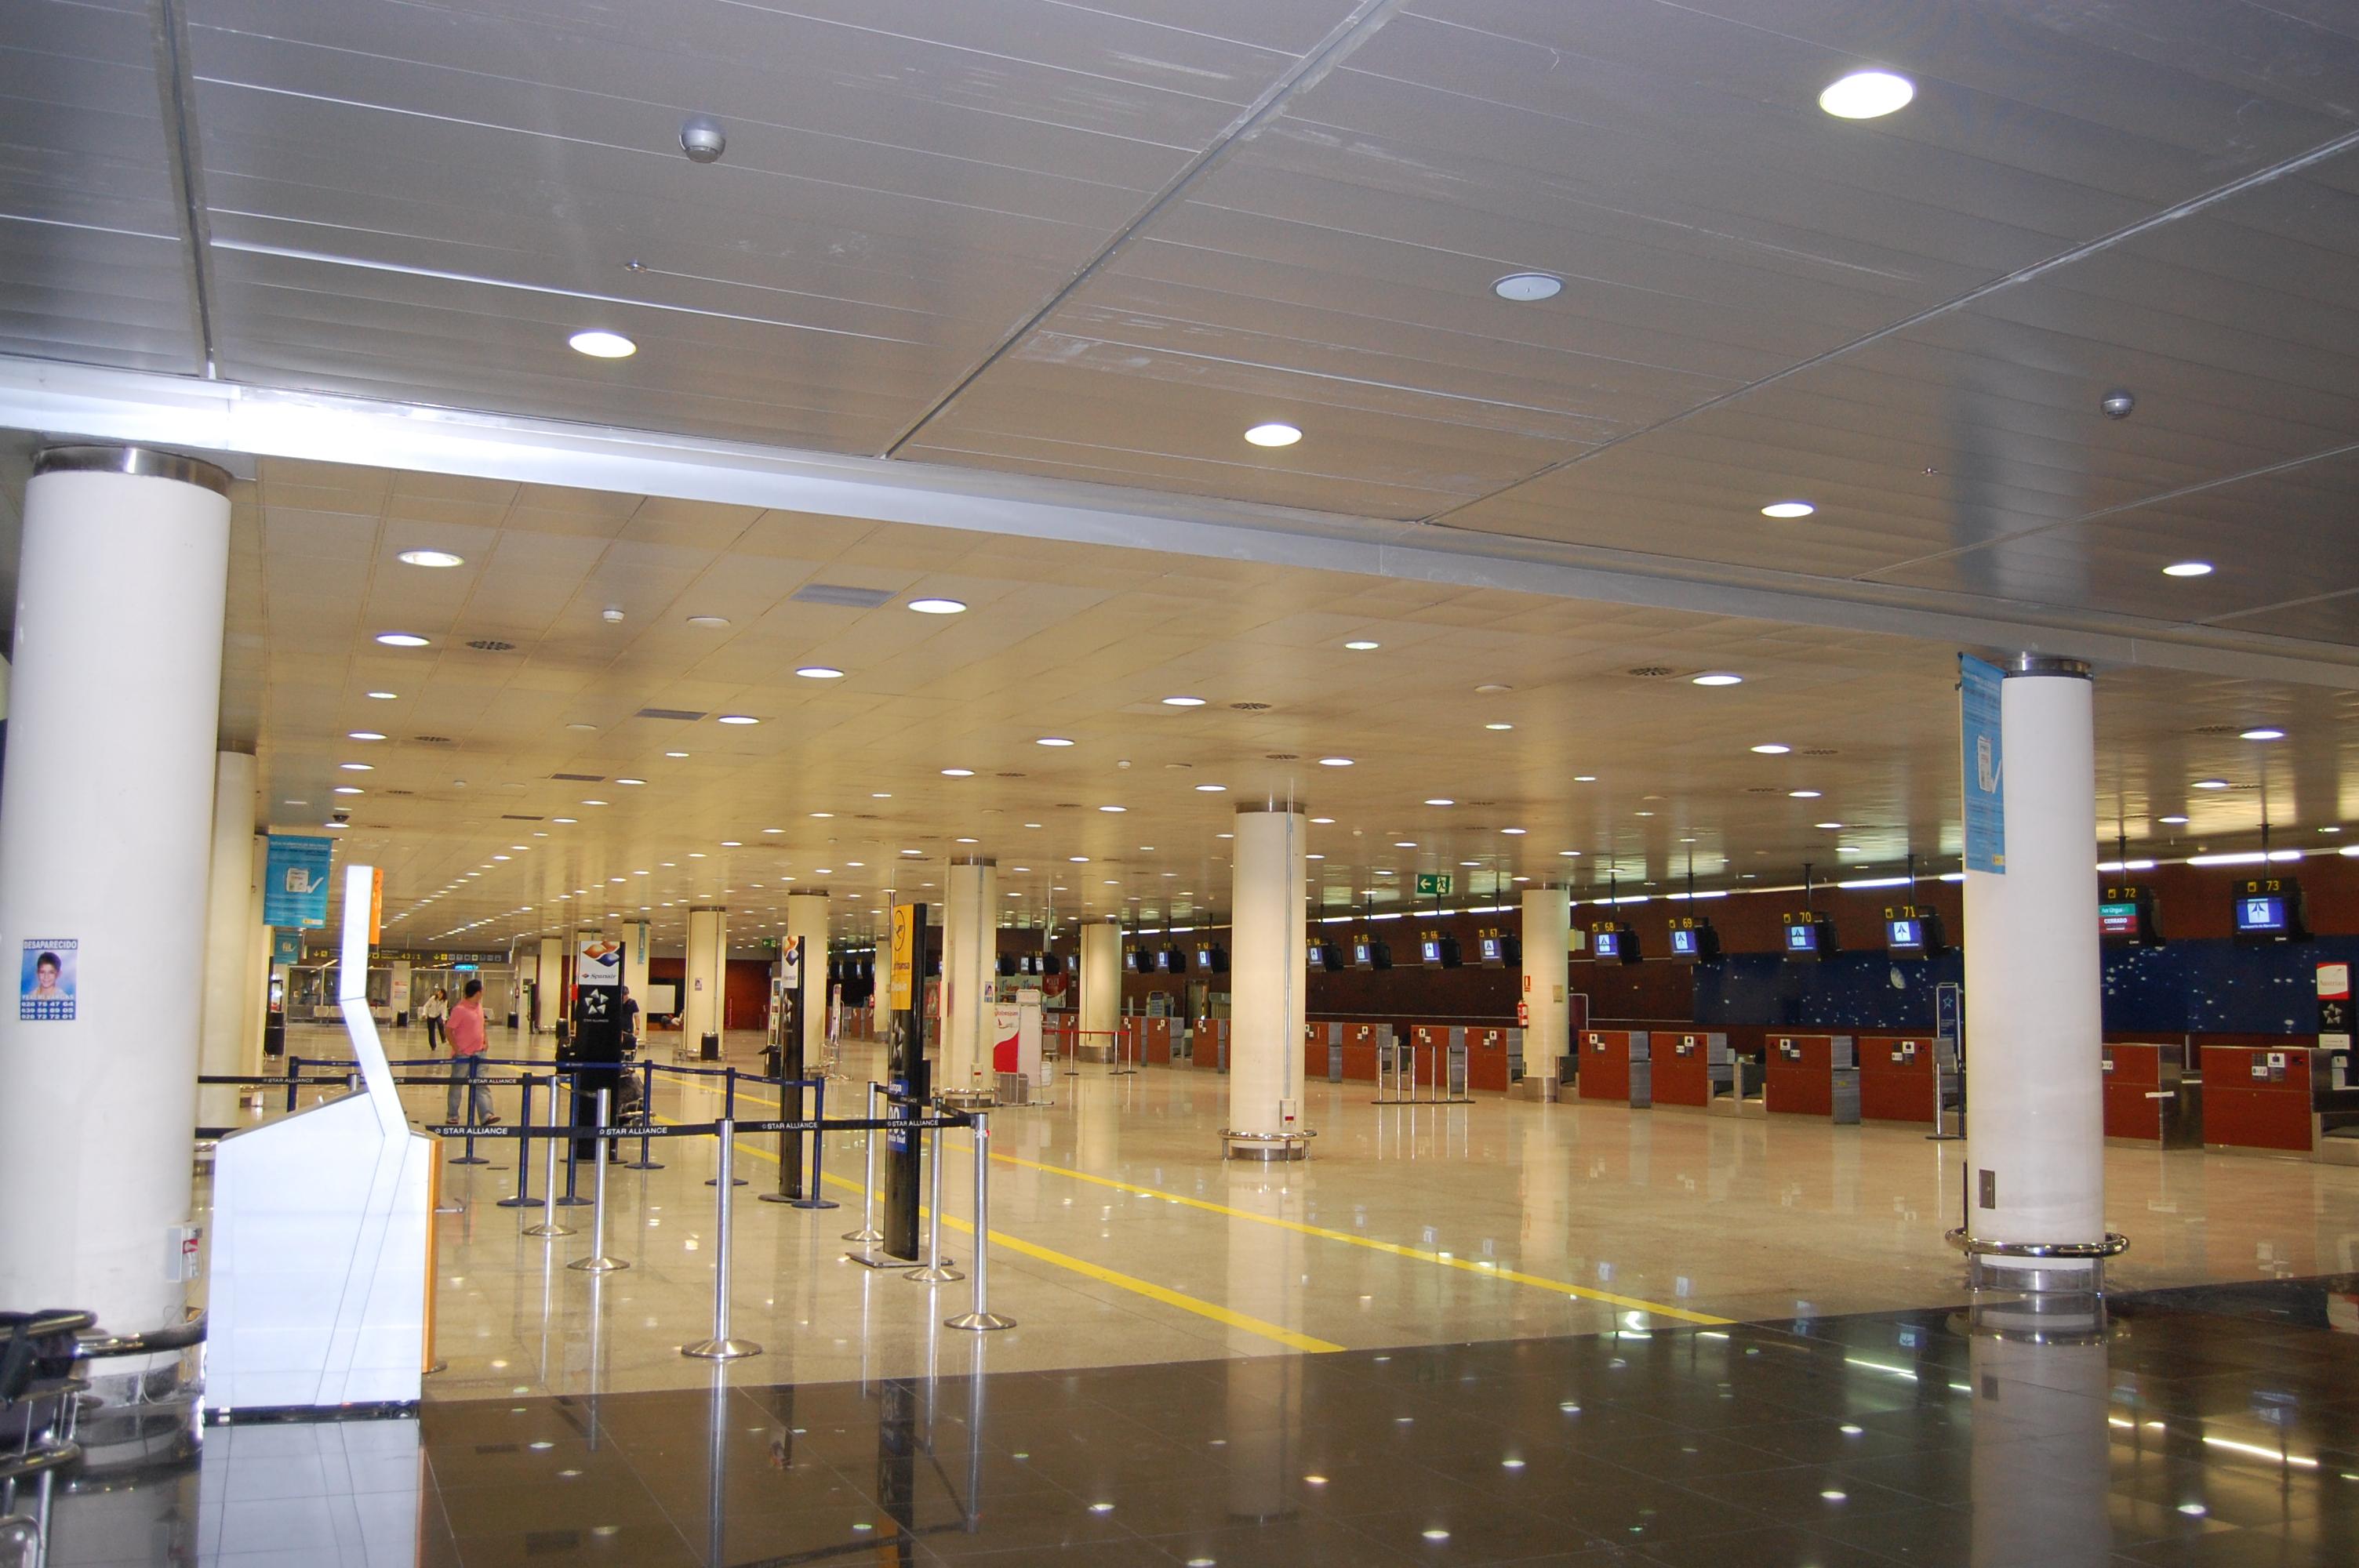 Табло аэропорта аликанте испания фото